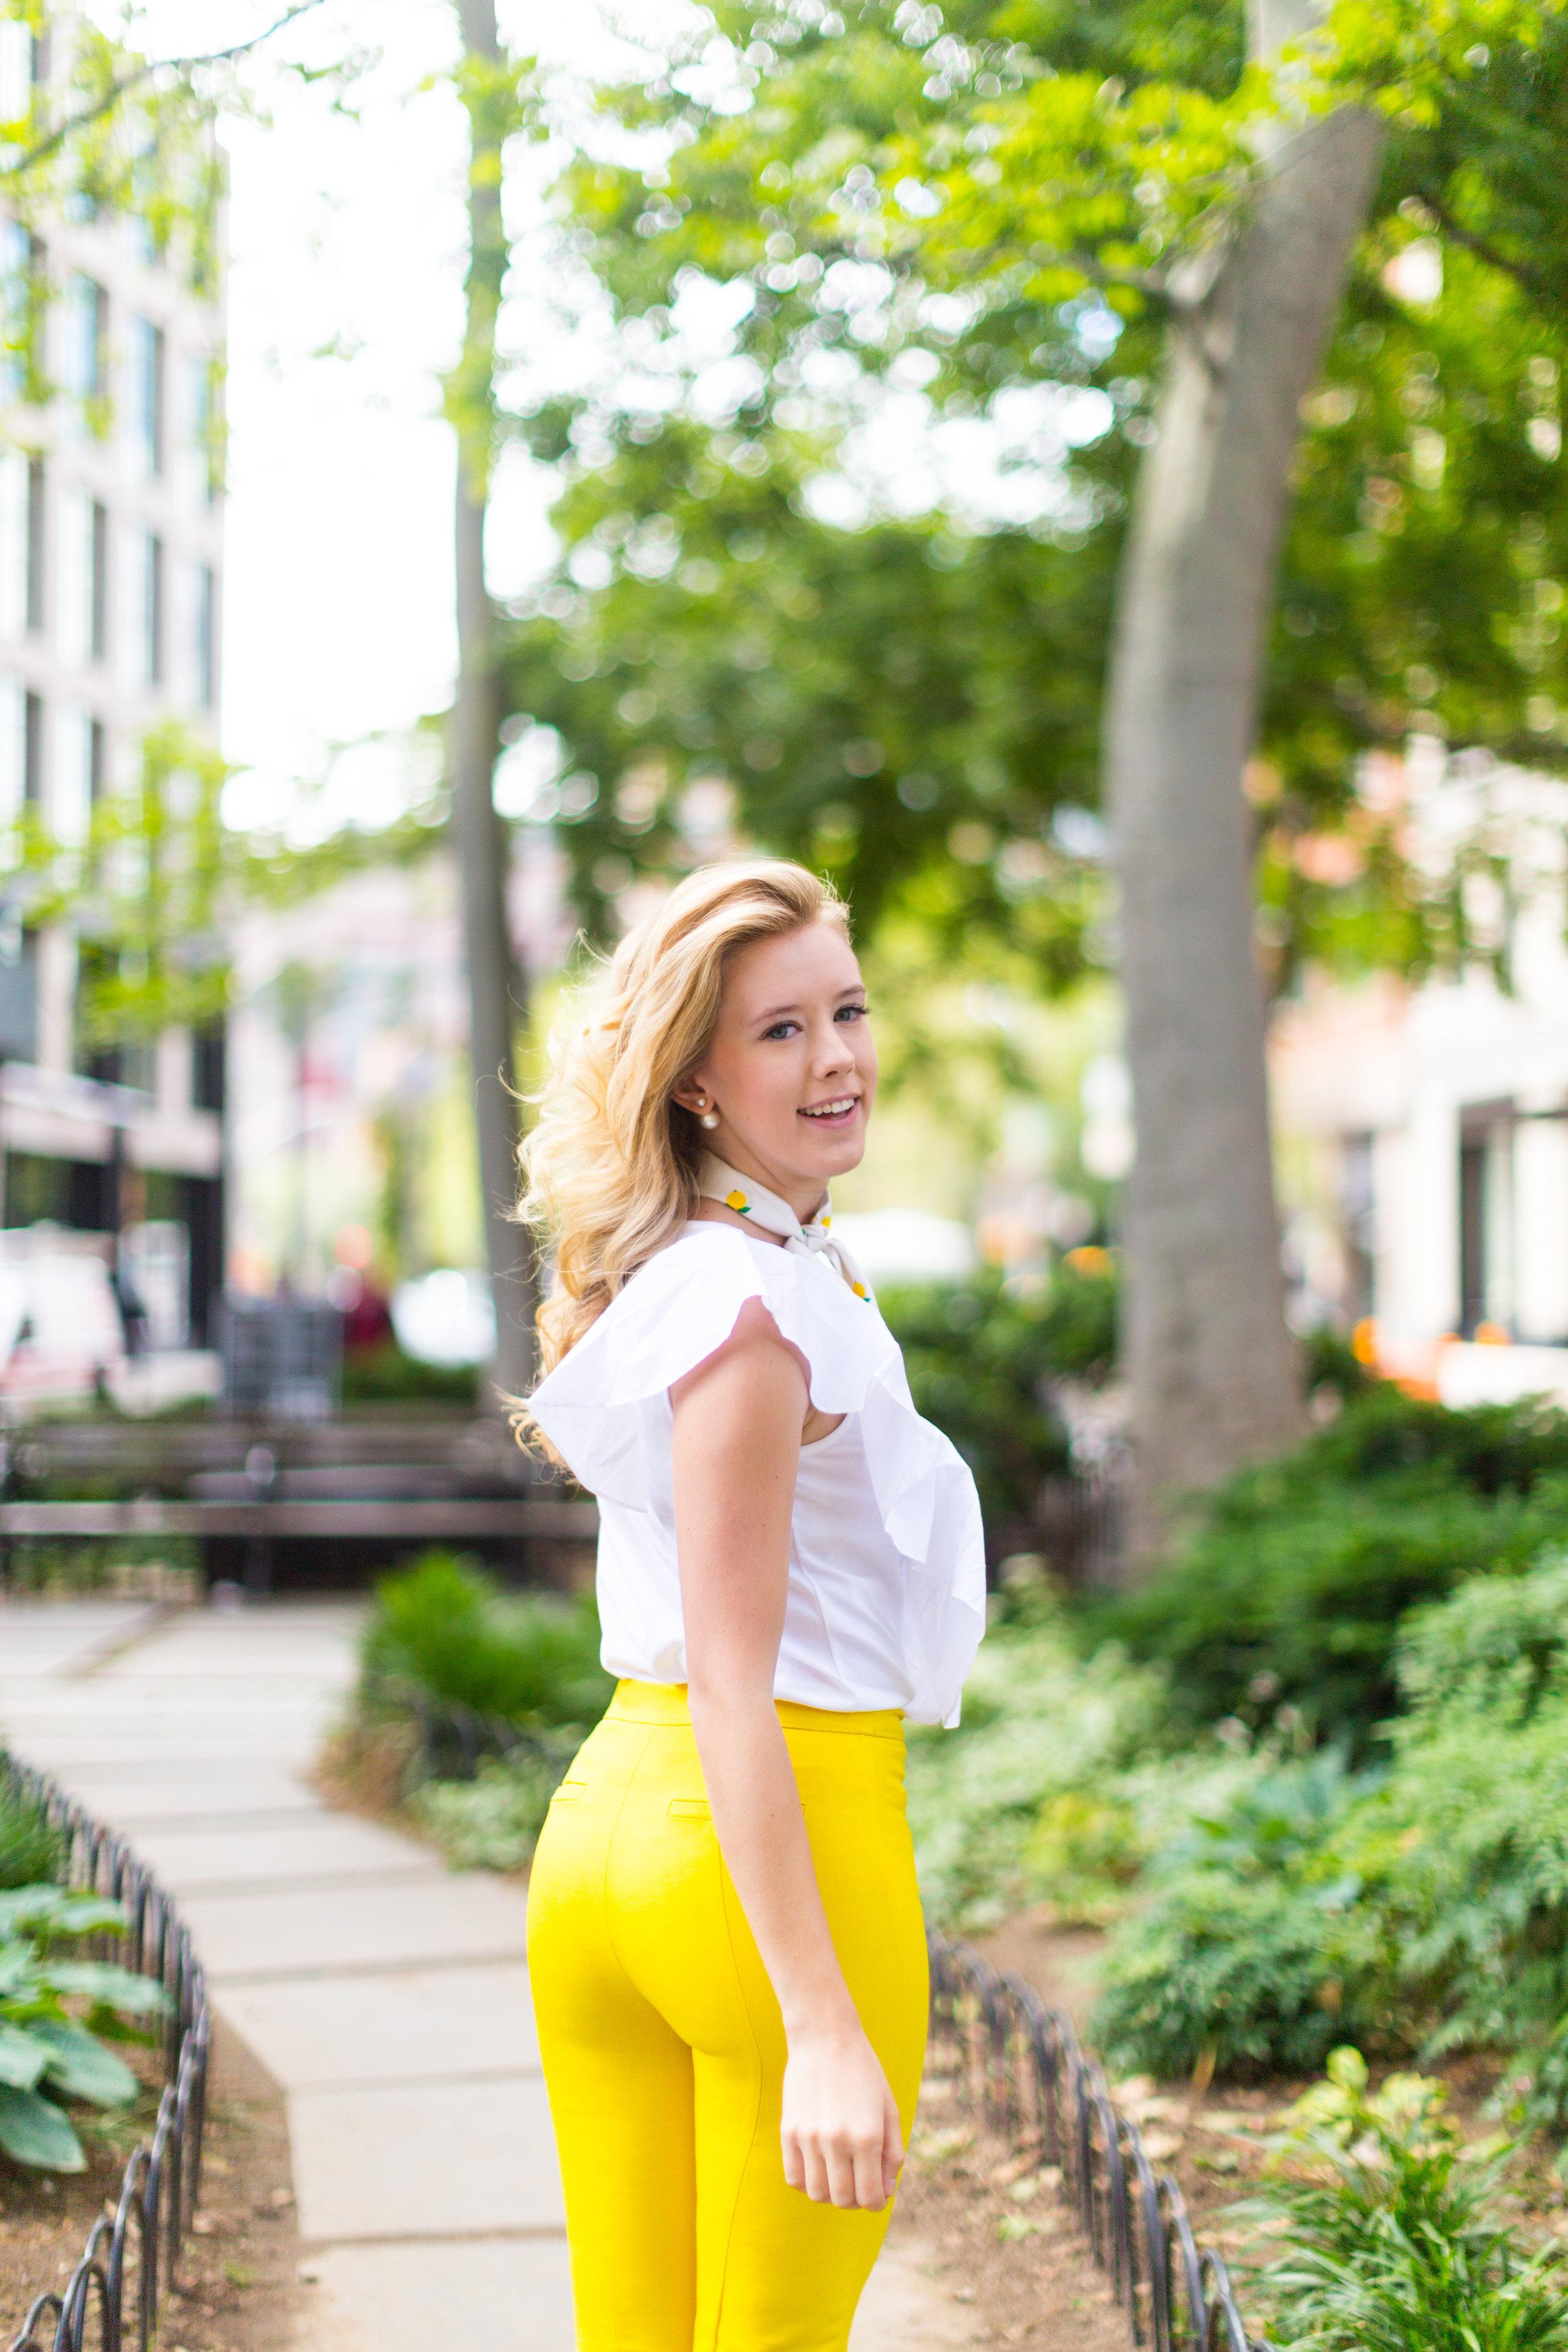 NYC Summer Yellow Lemon Print Outfit-7.jpg